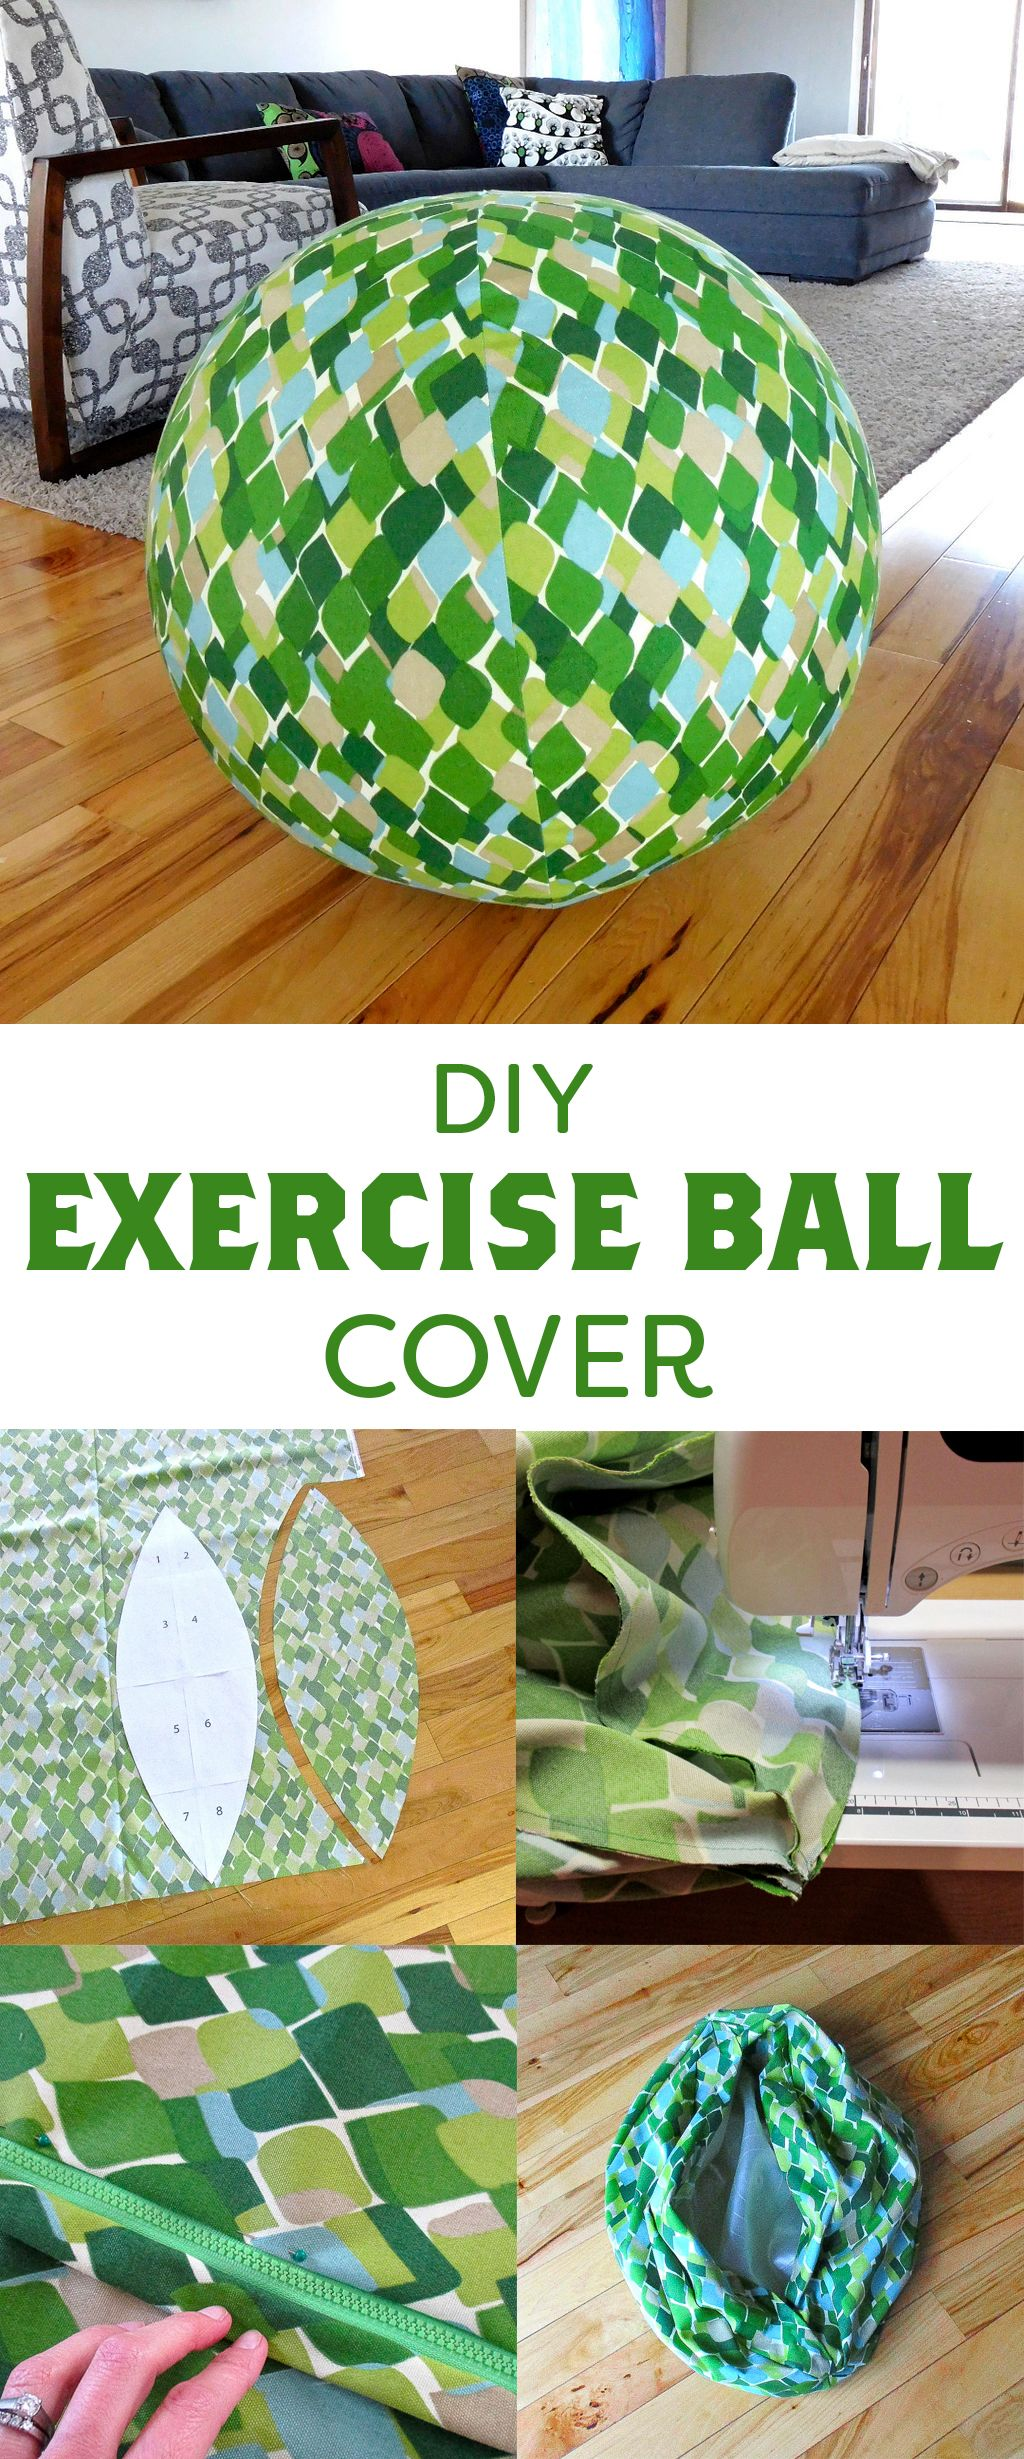 DIY Exercise Ball Cover Ball chair, Fabric balls, Diy chair